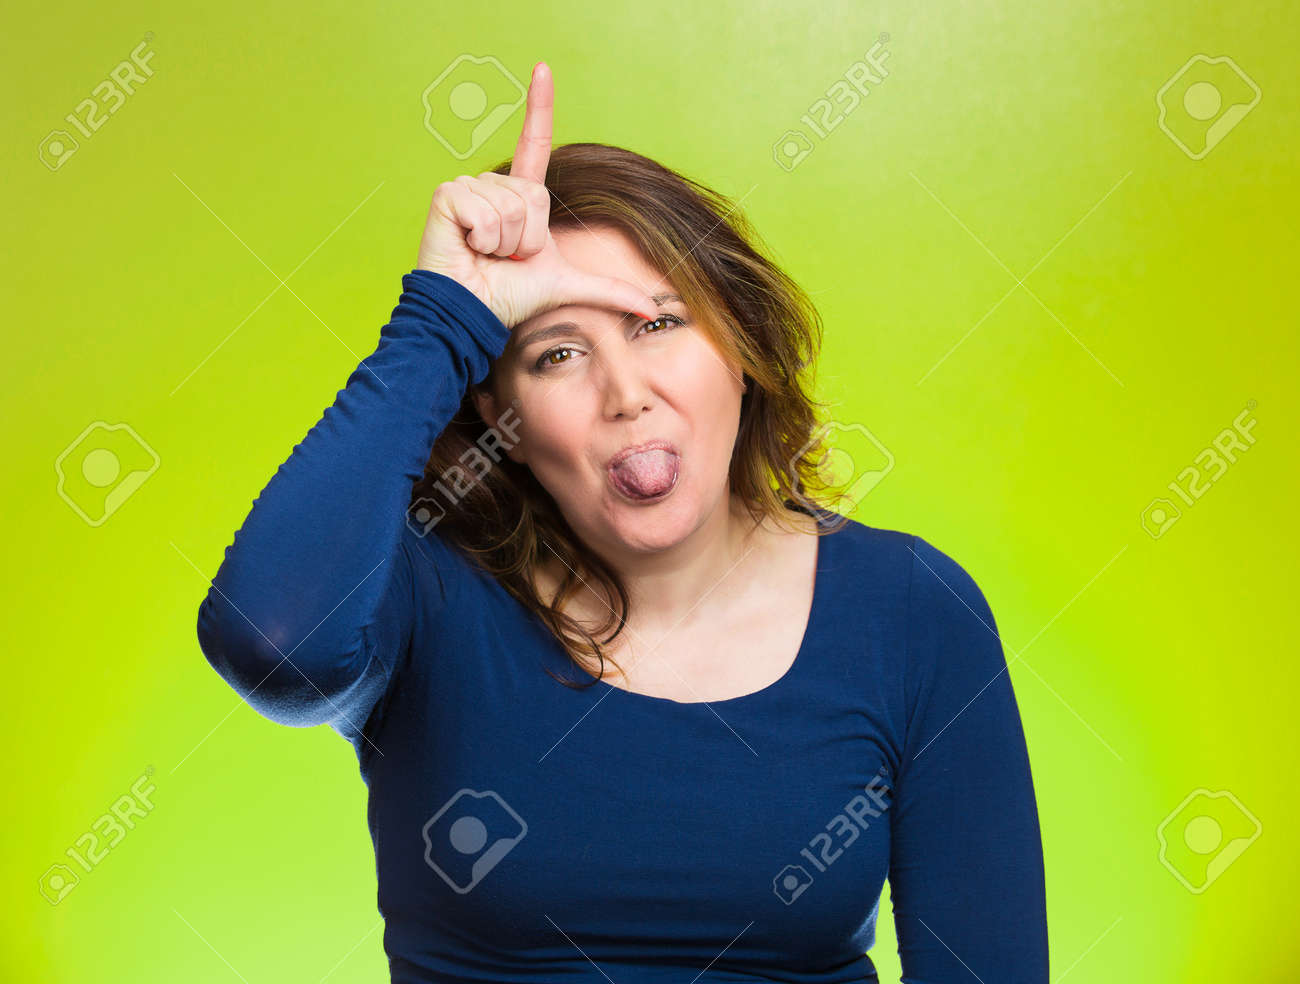 sticking tongue out body language